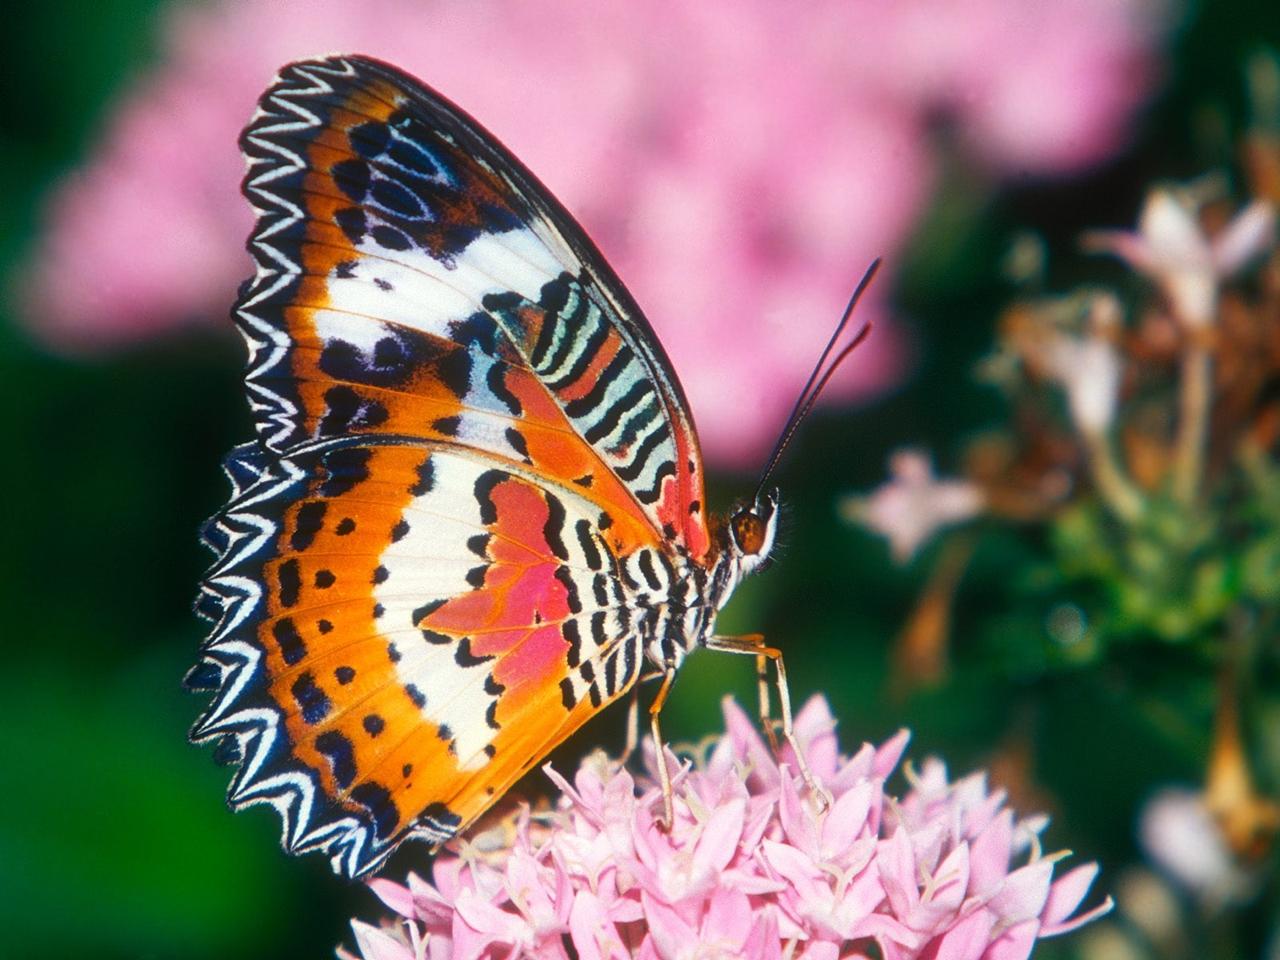 Pictures of butterflies 12